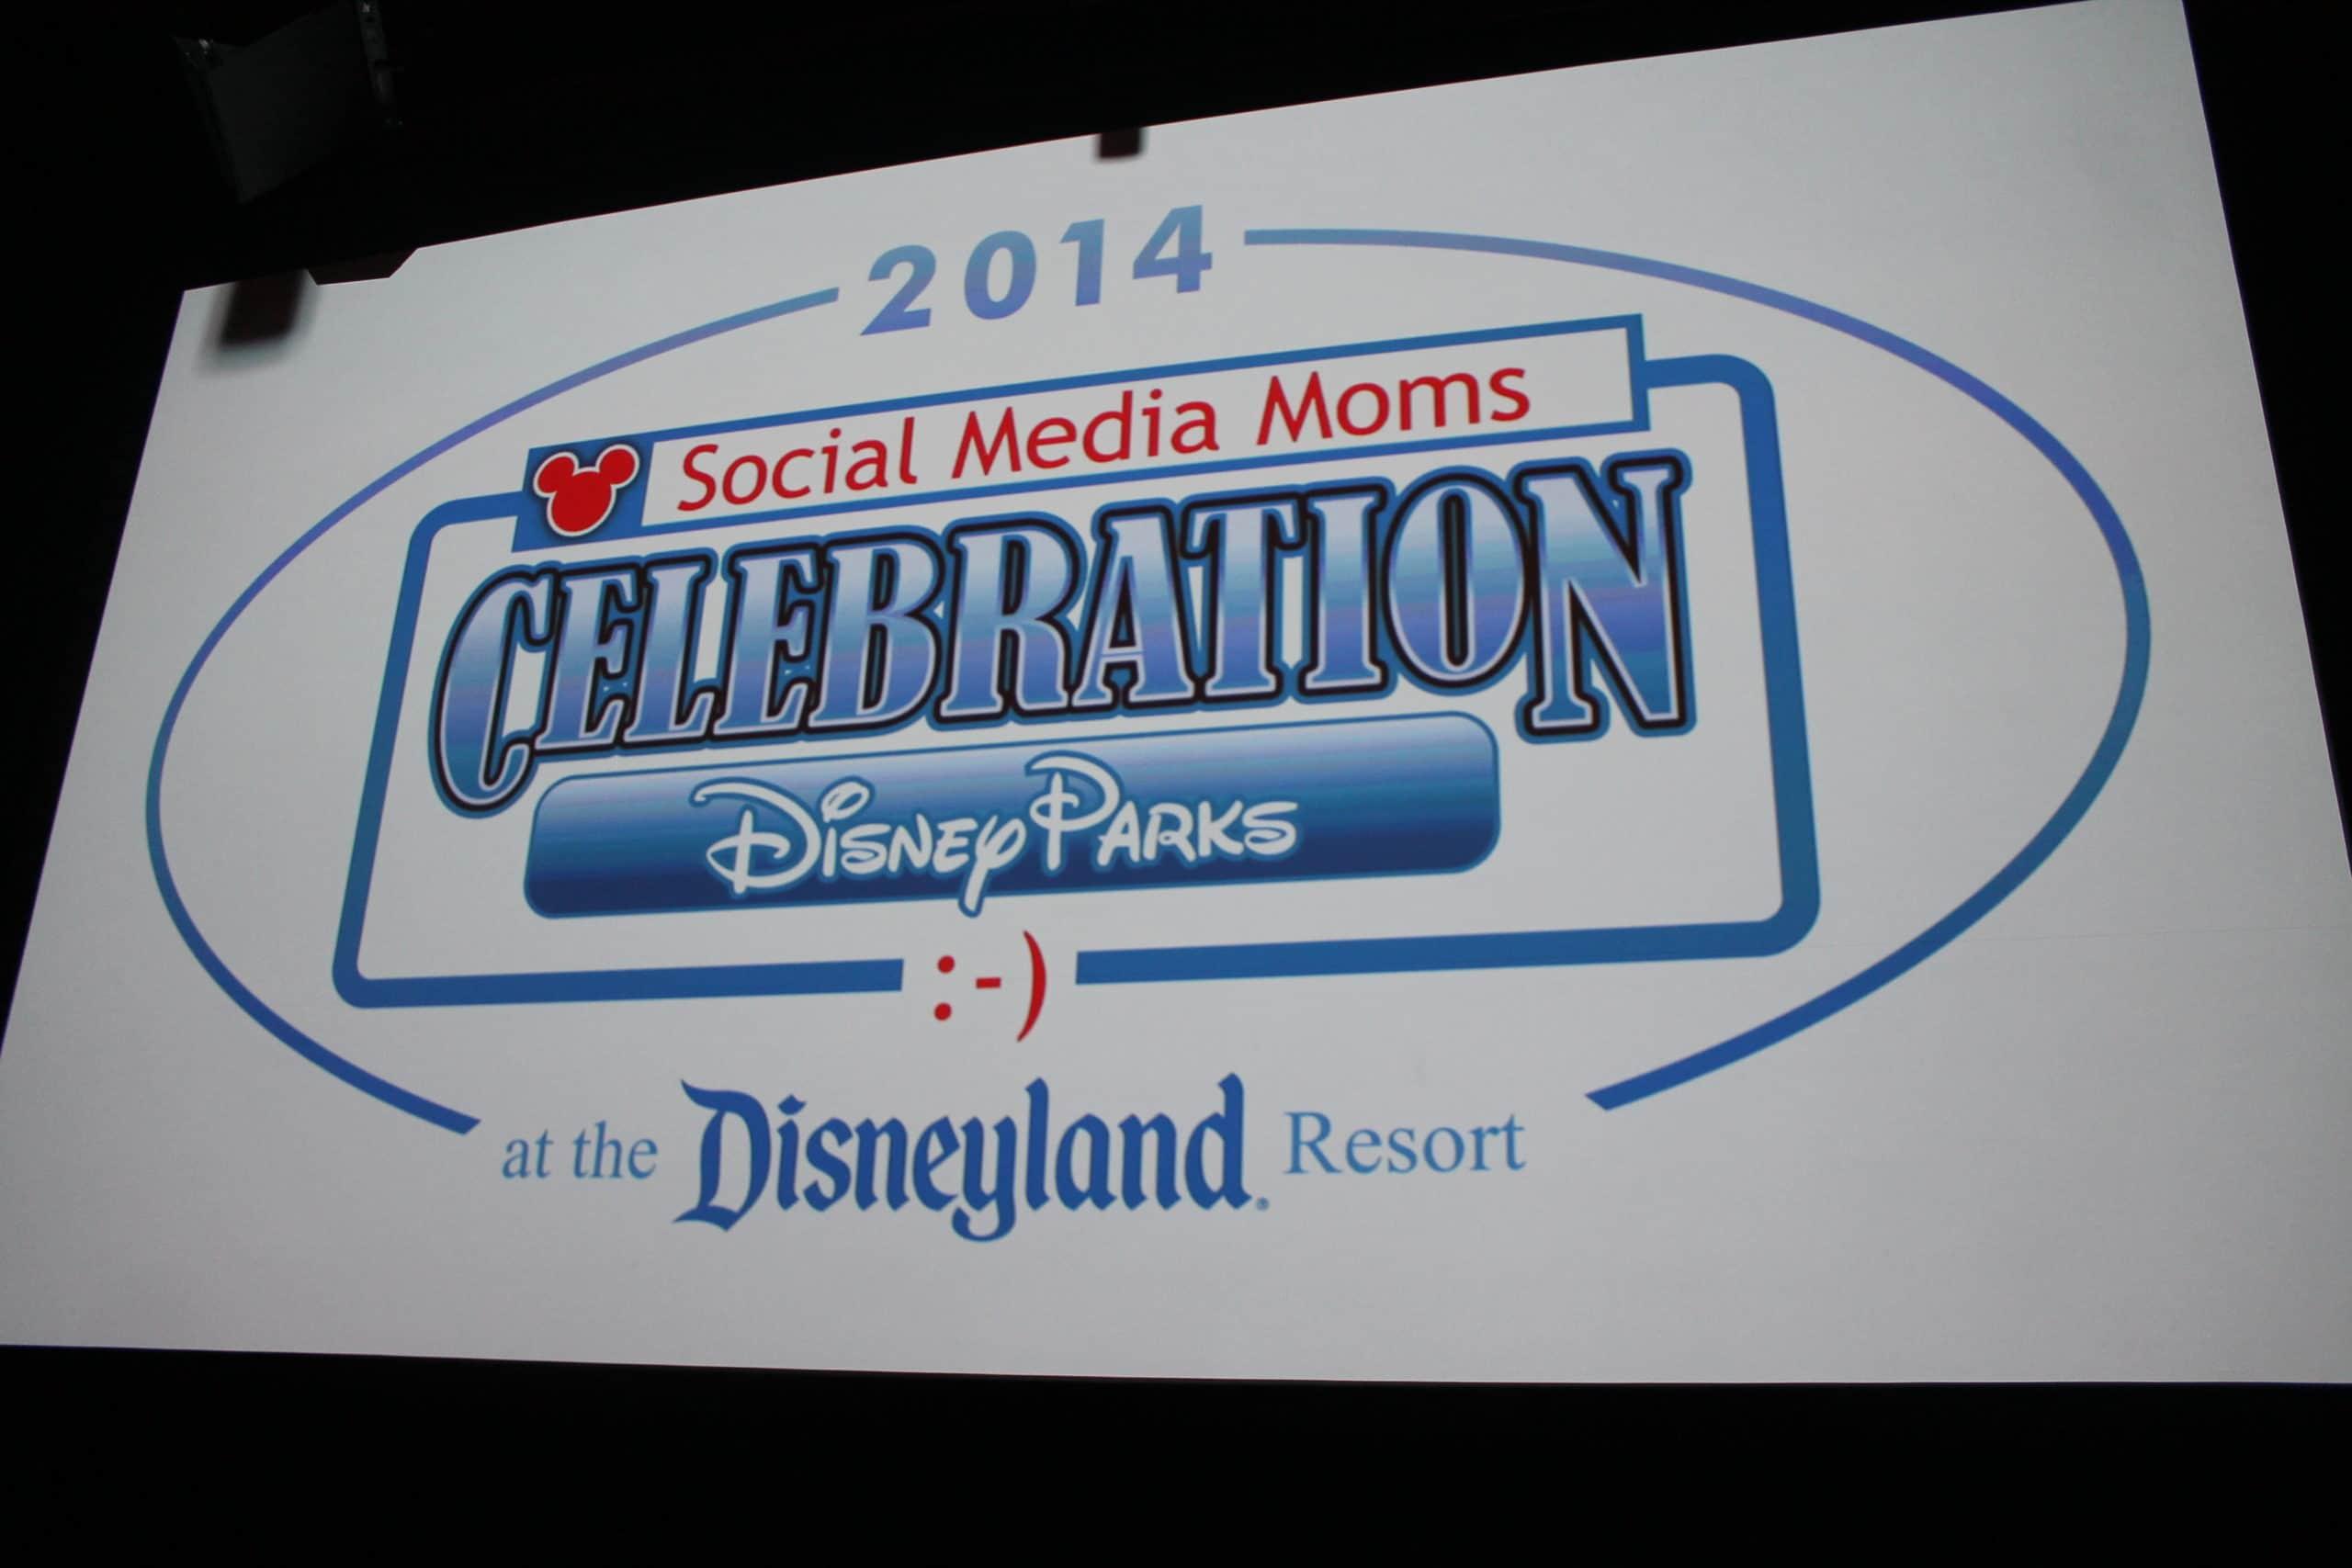 Disney Social Media Moms 2014: Disney Junior and Coming Events Preview Breakfast